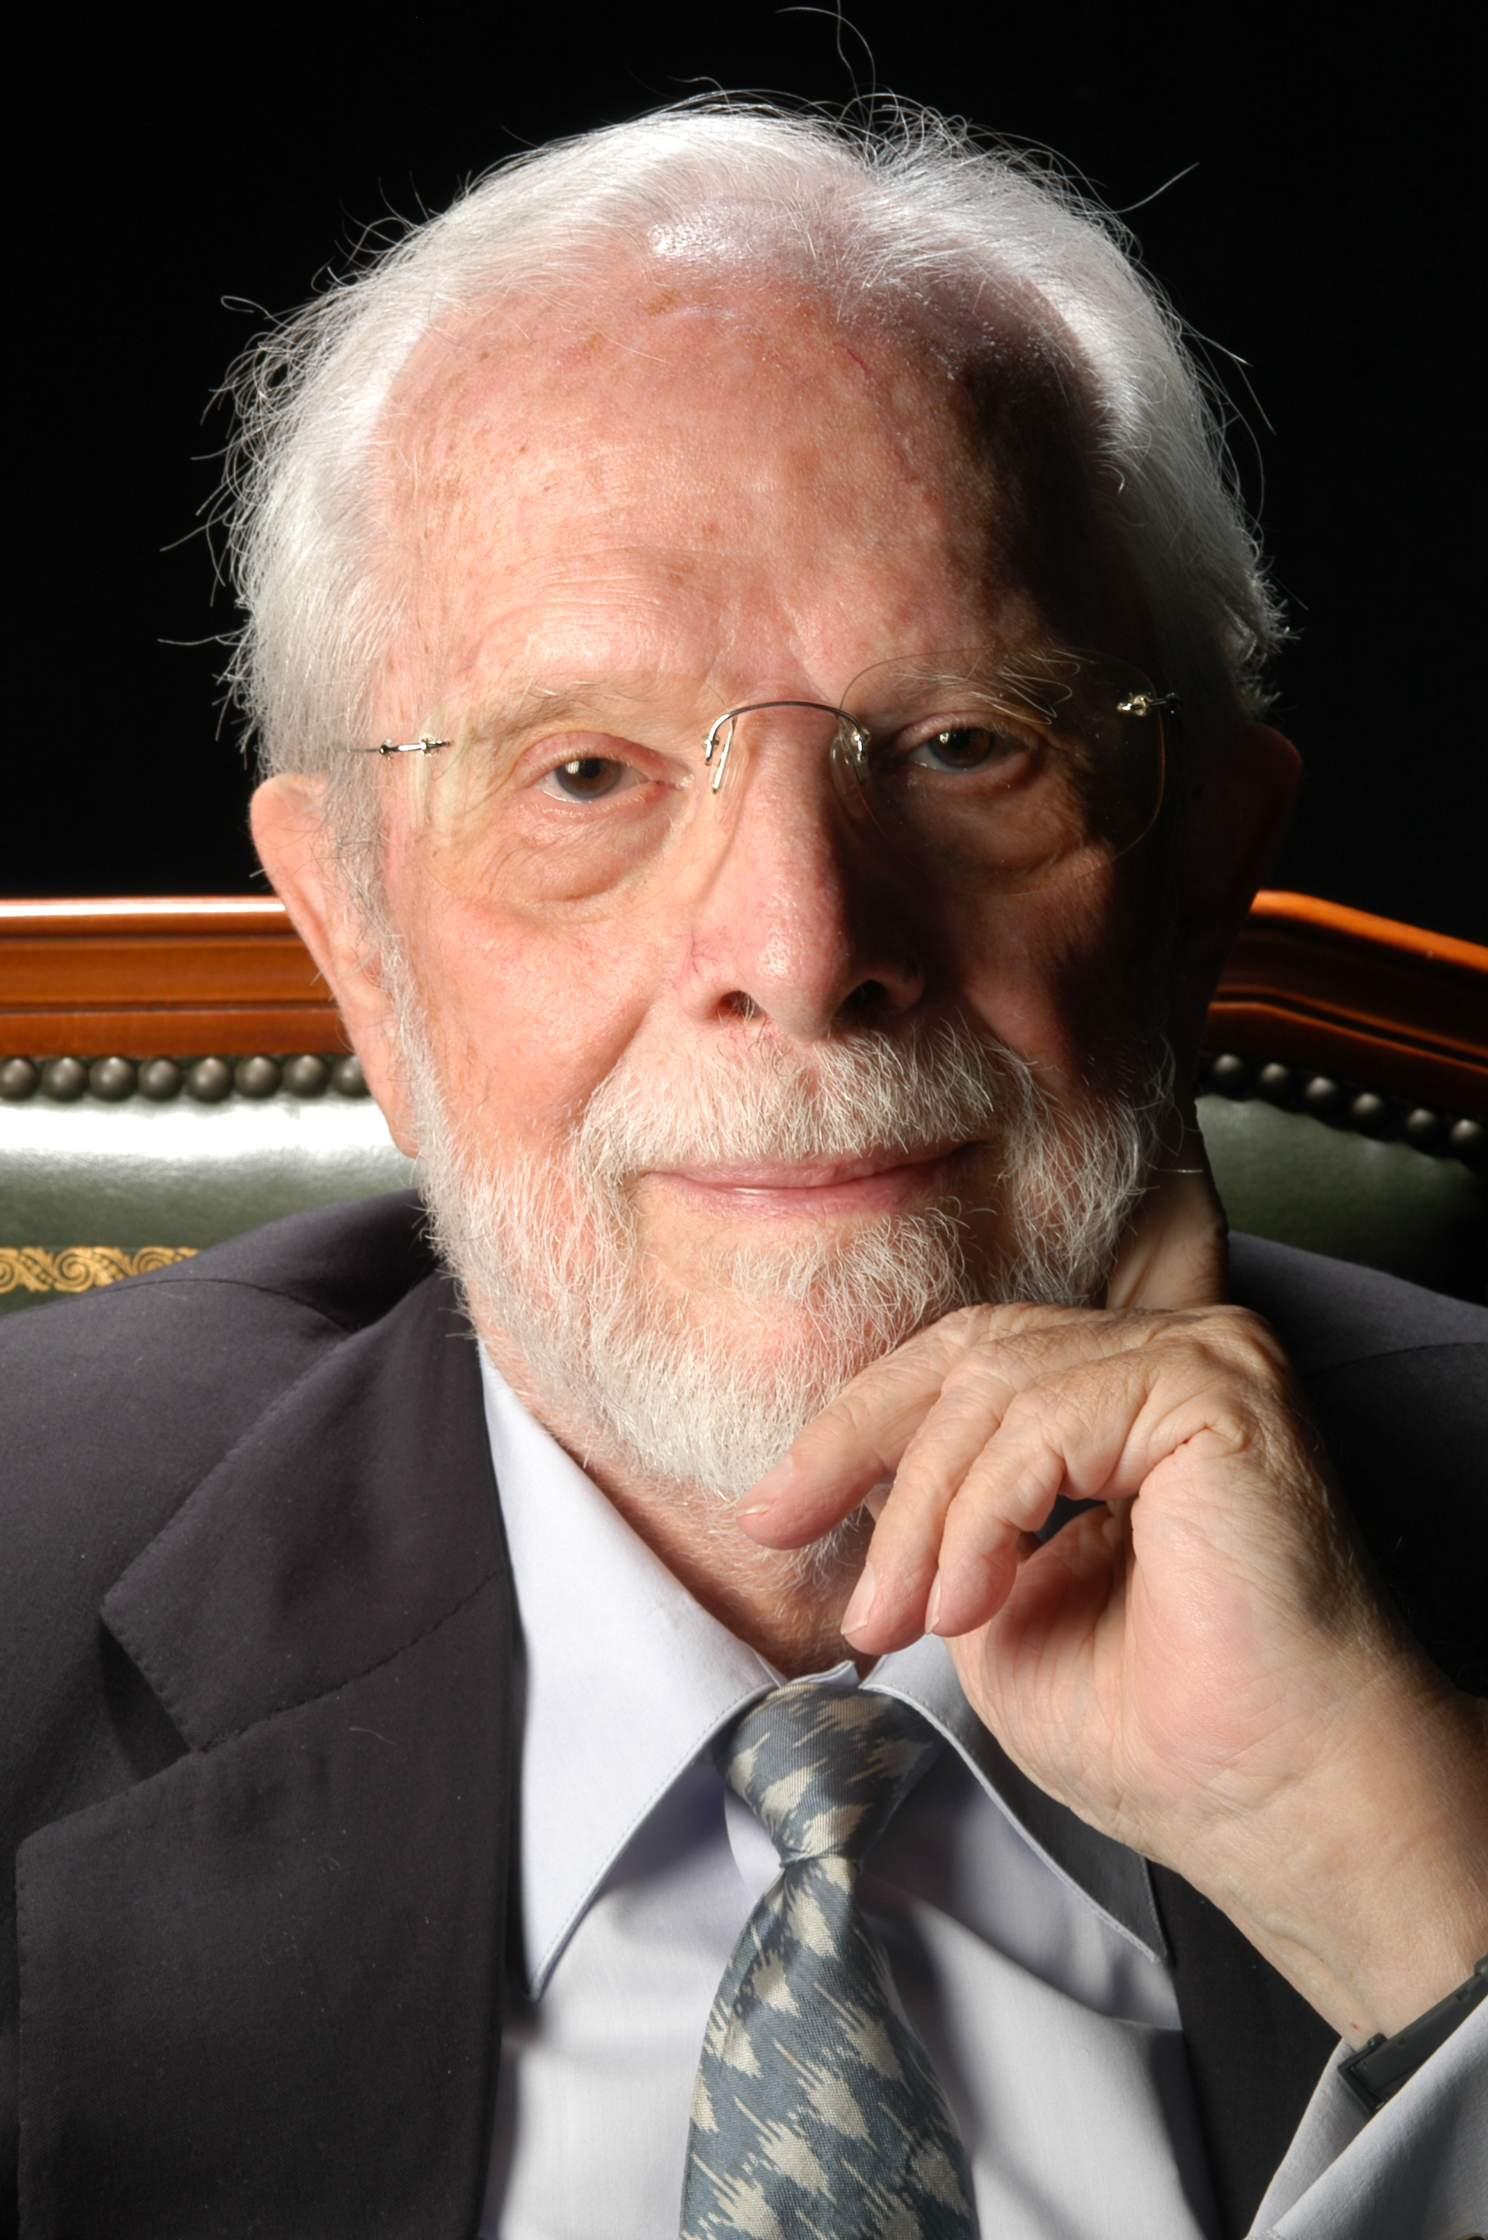 Sr. Josep Maria Fargas Falp